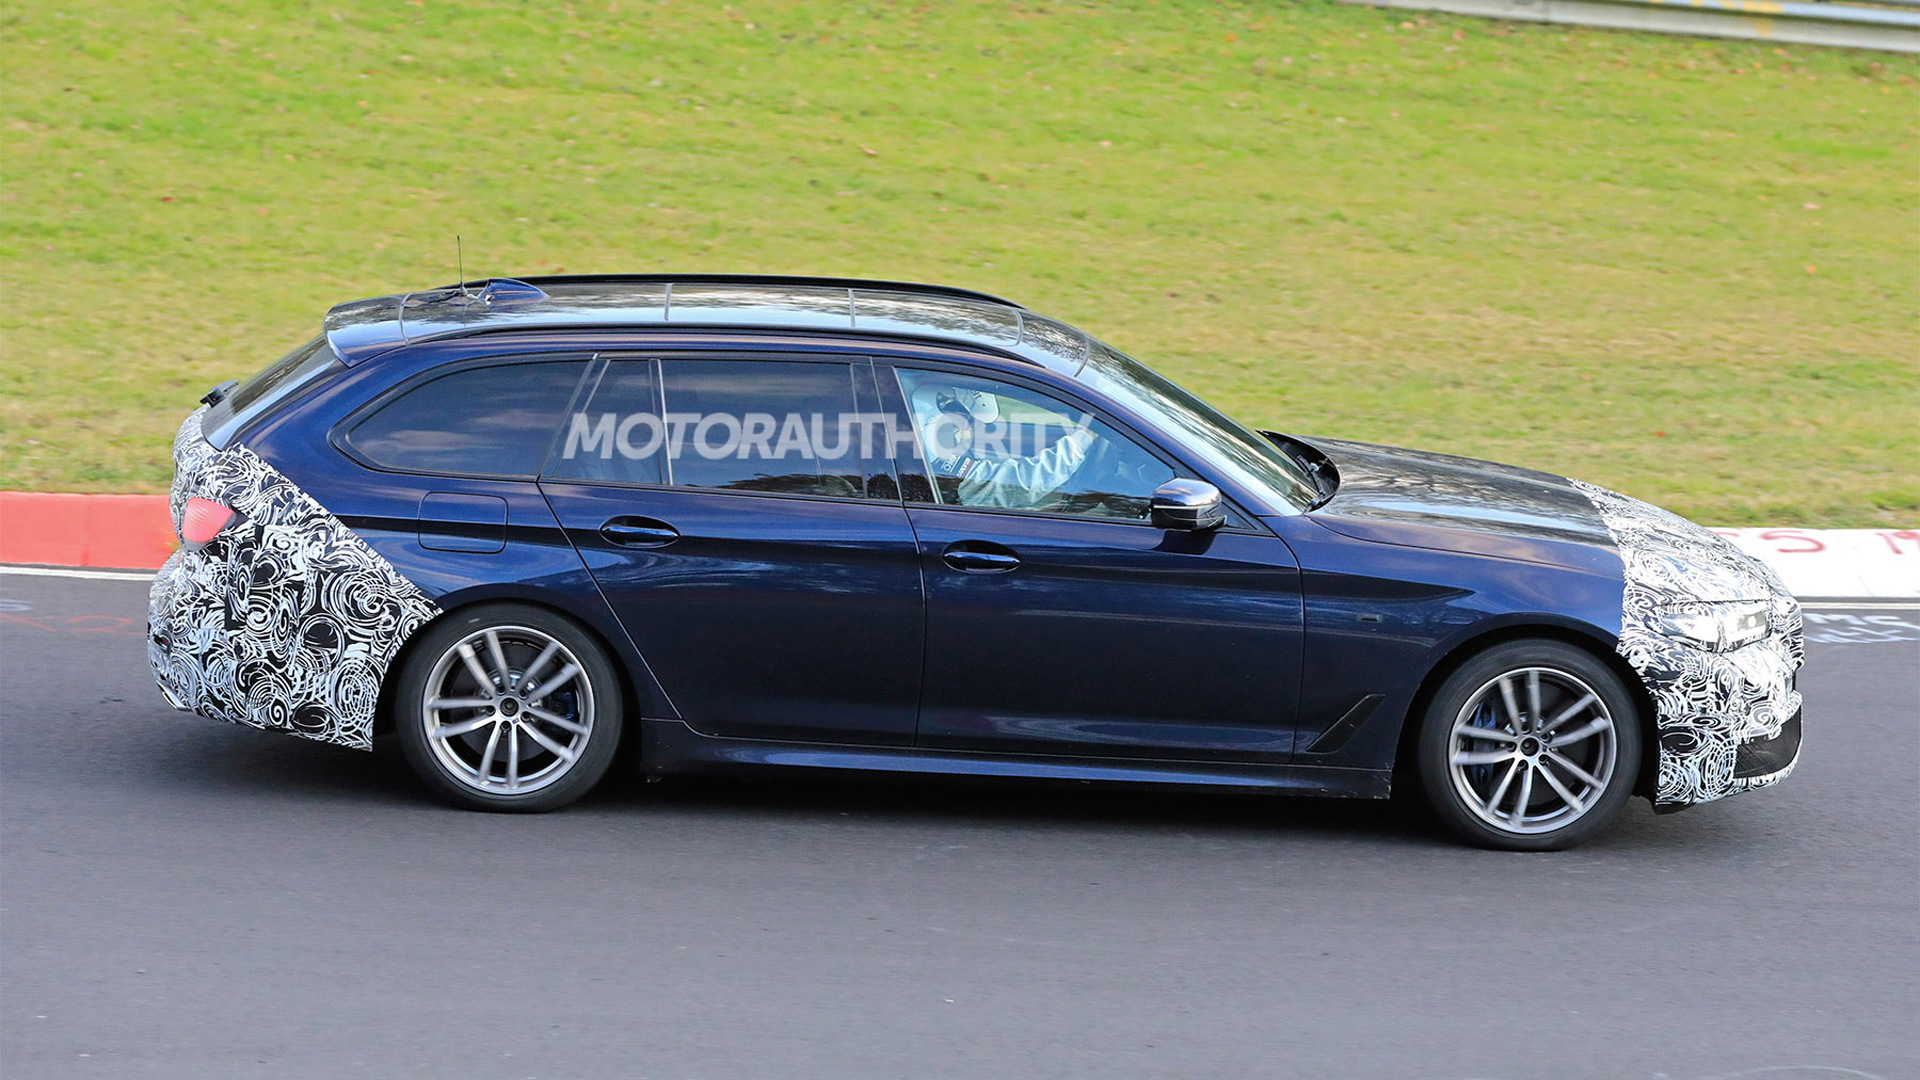 2021 BMW 5-Series Touring facelift spy shots - Photo credit: S. Baldauf/SB-Medien